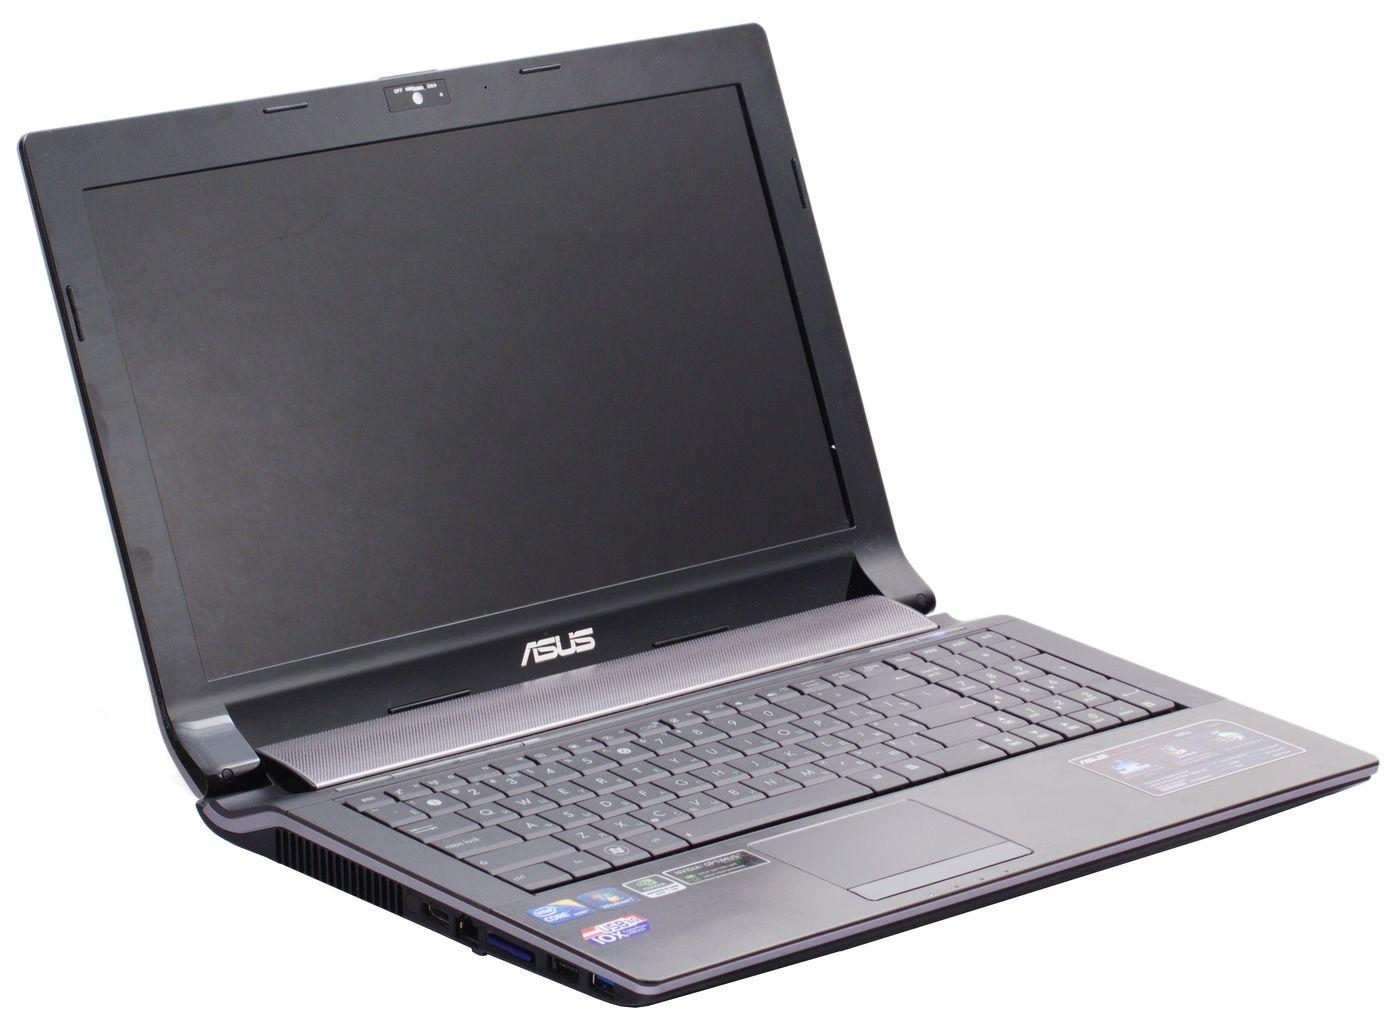 Asus N53JL Notebook Intel Graphics Windows Vista 32-BIT